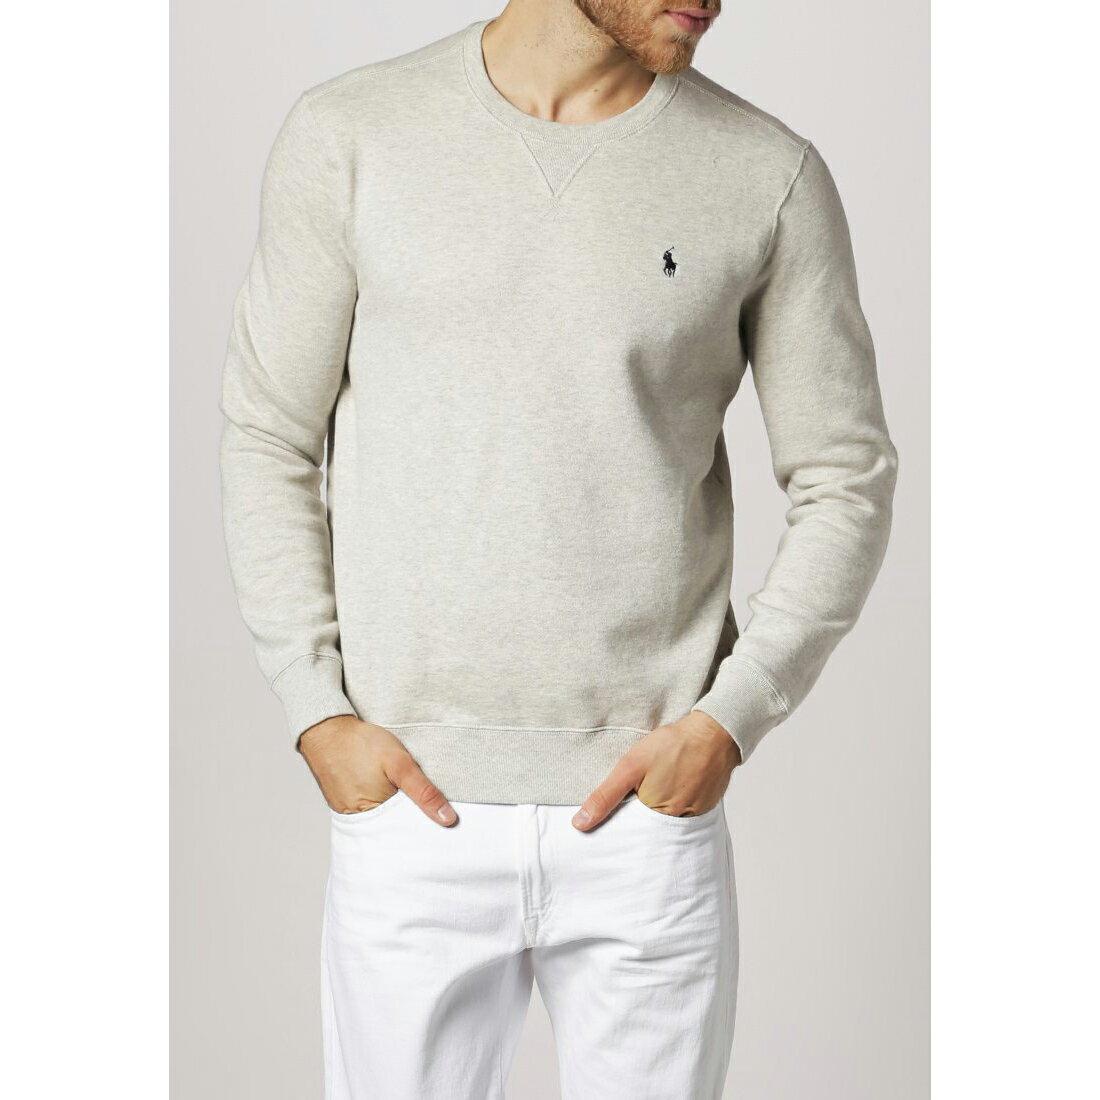 美國百分百【Ralph Lauren】T恤 RL 長袖 小馬 針織 灰 polo 大學T 上衣 M L 男 C524